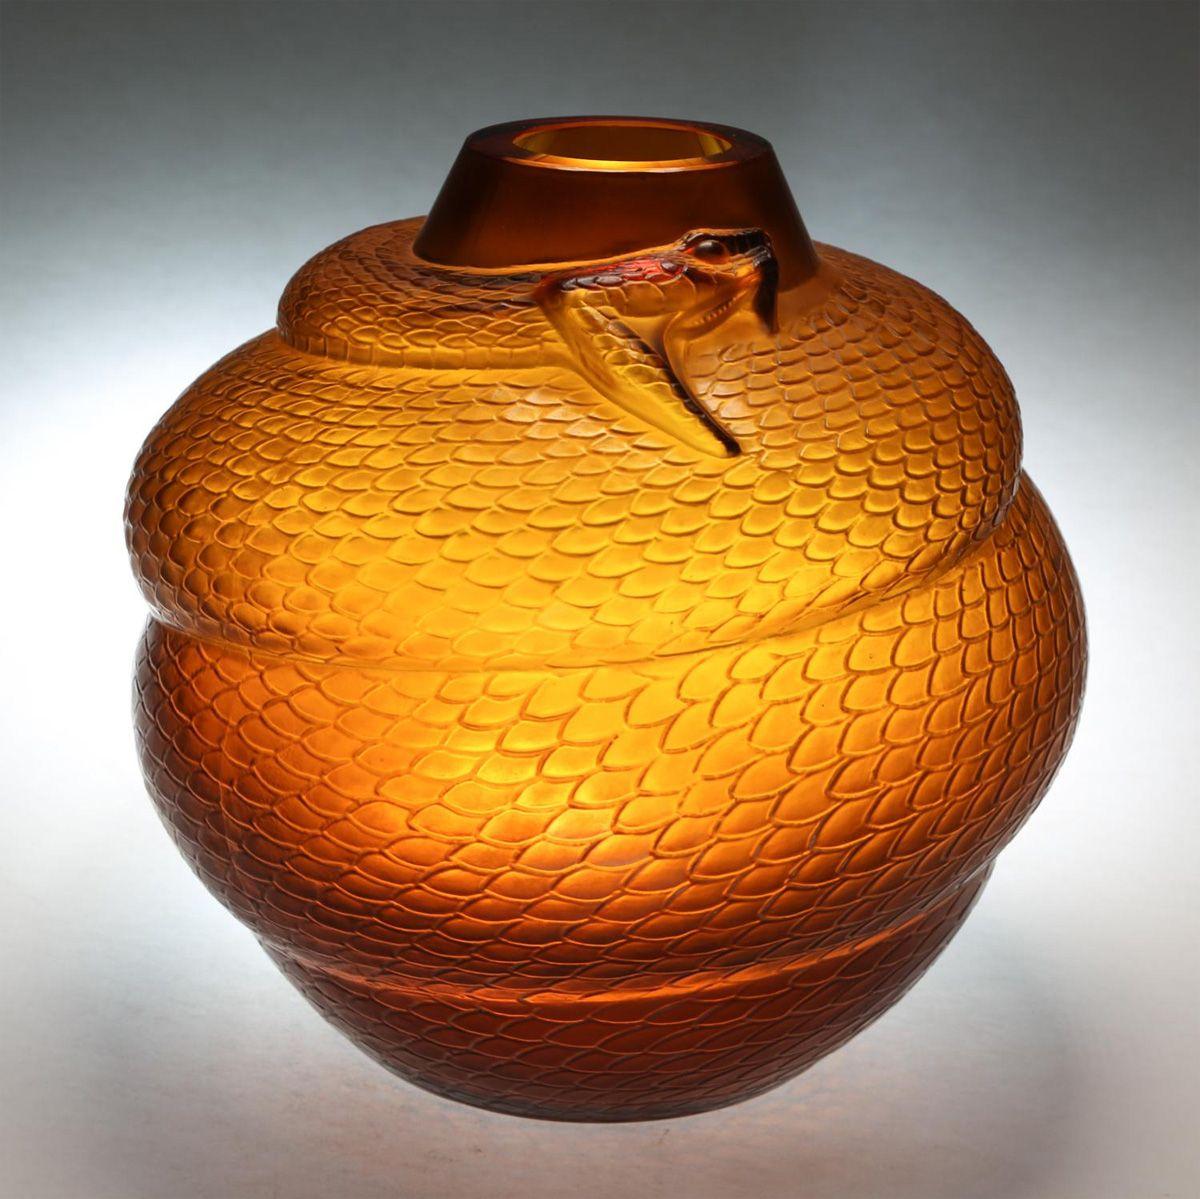 Serpent Vase by René Lalique, amber glass, 1924